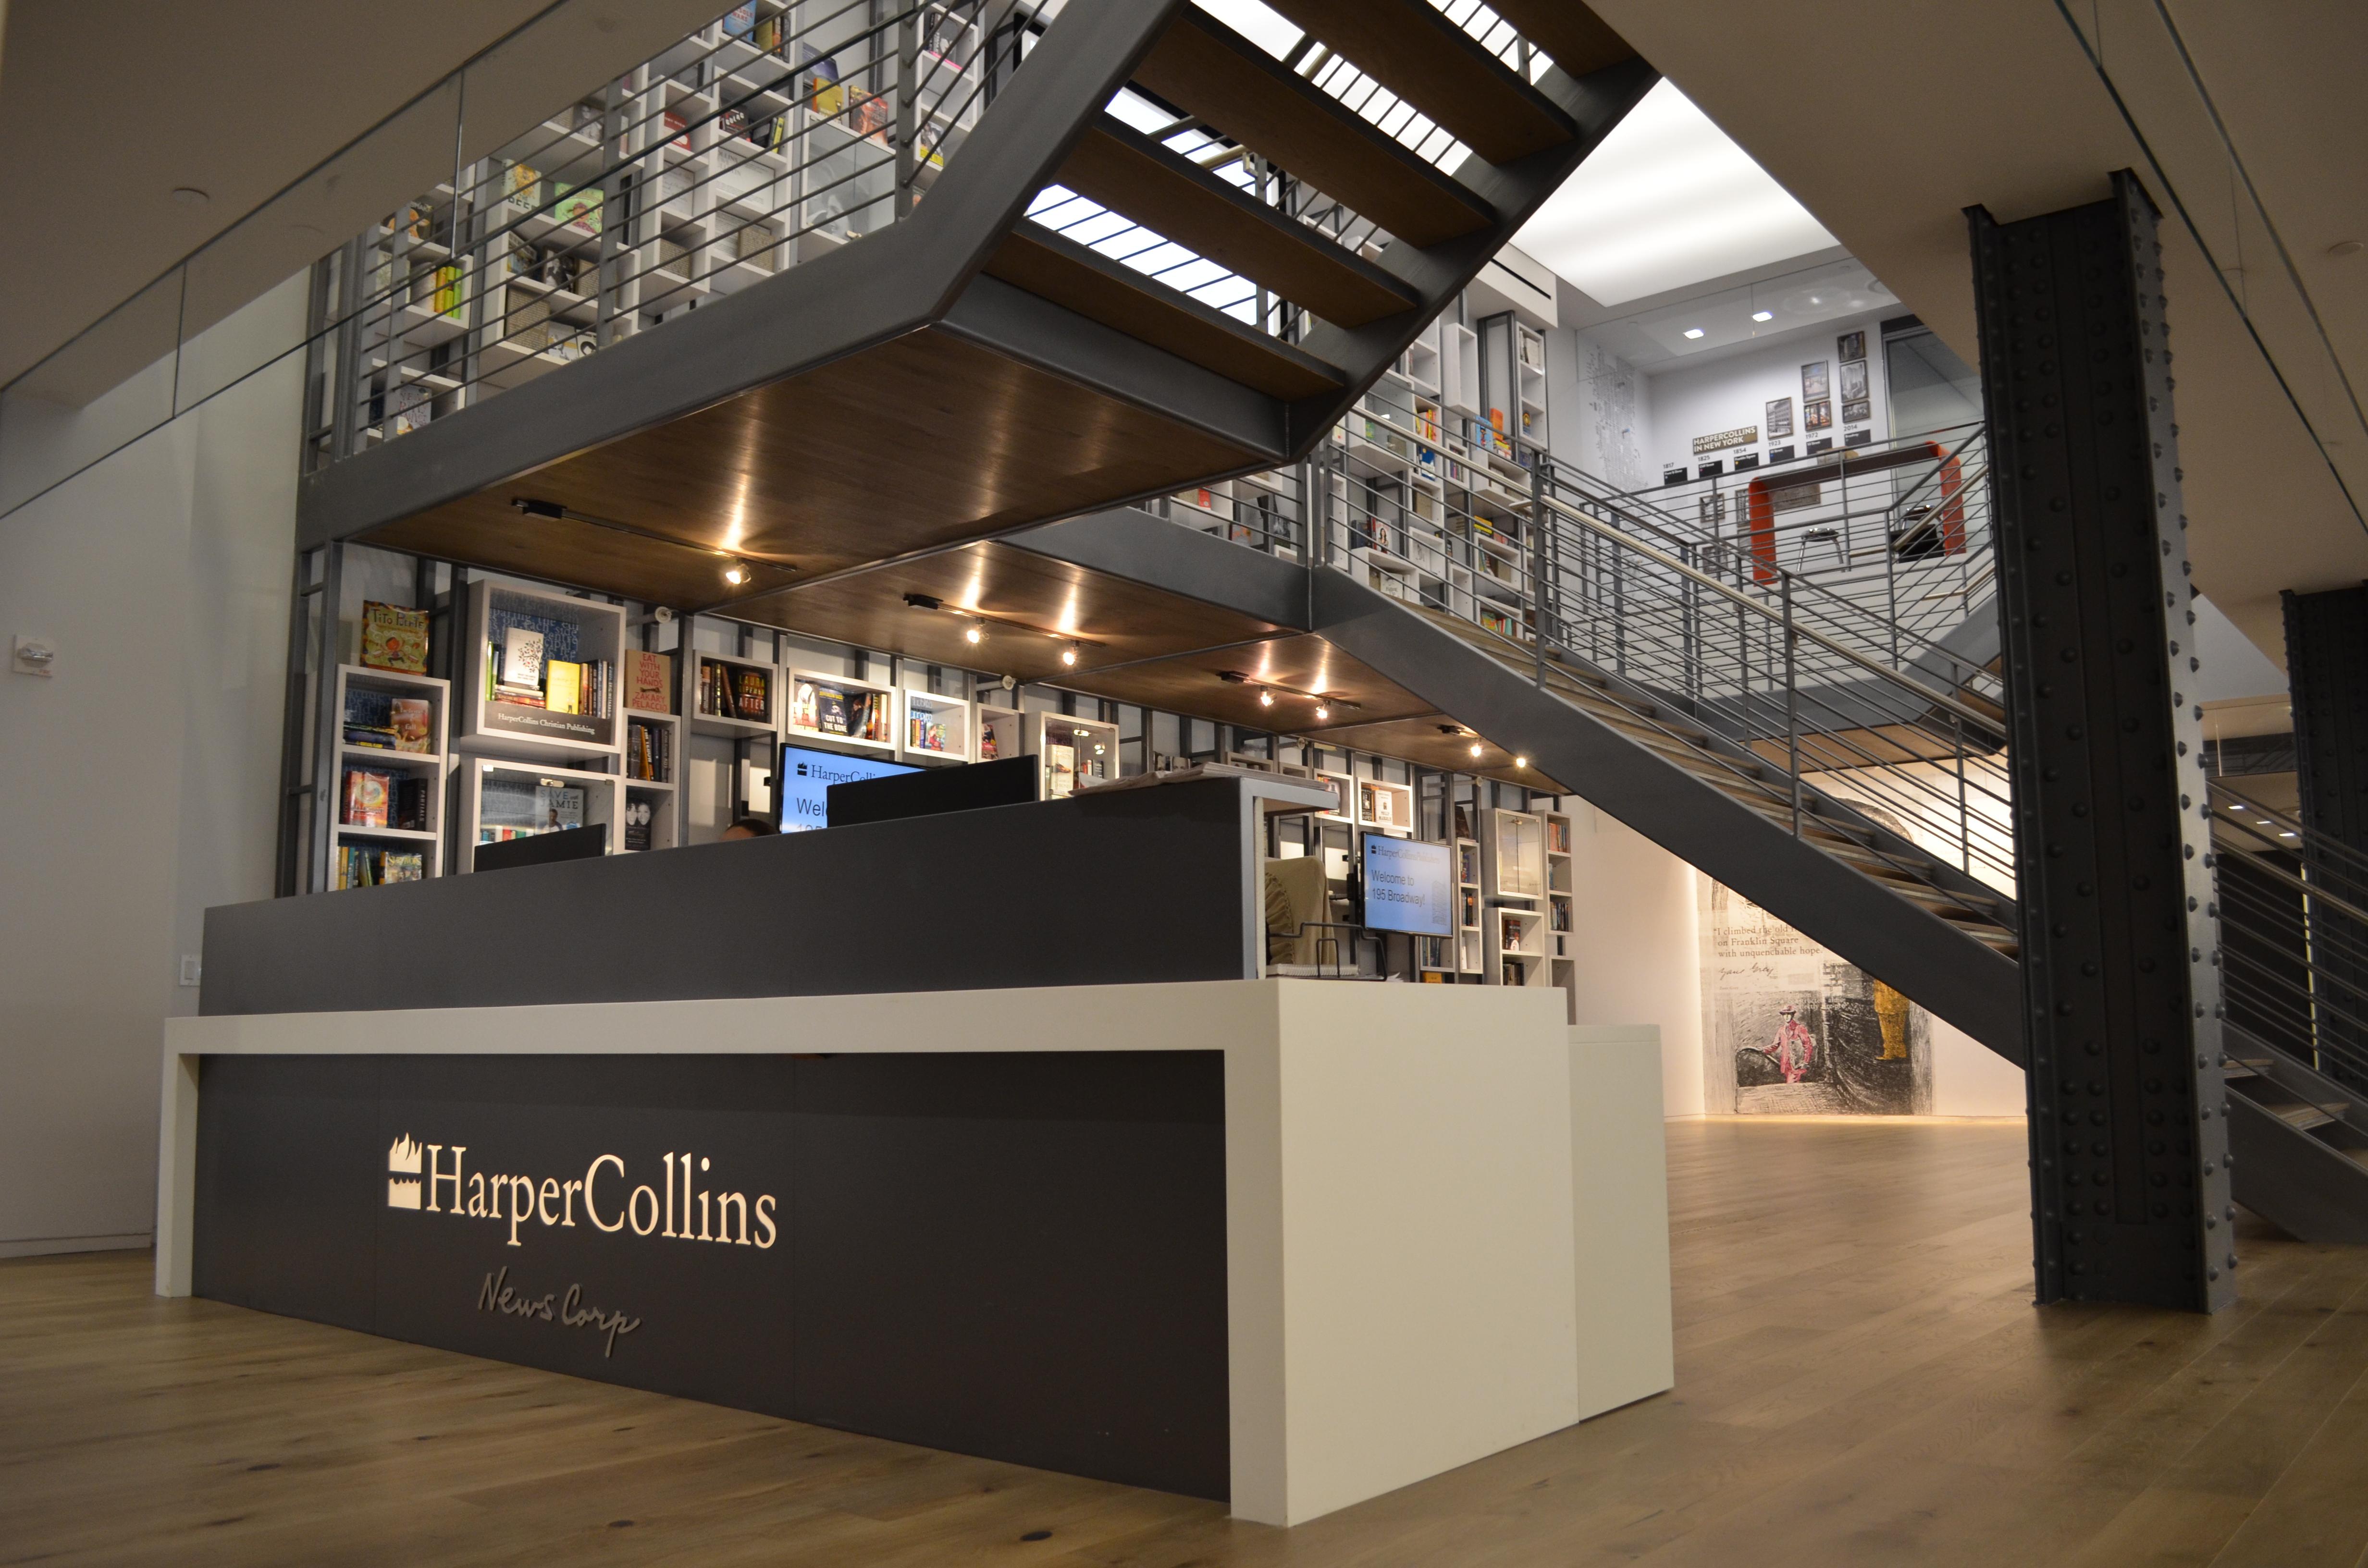 Earnings, Sales, Drop in Q1 at HarperCollins